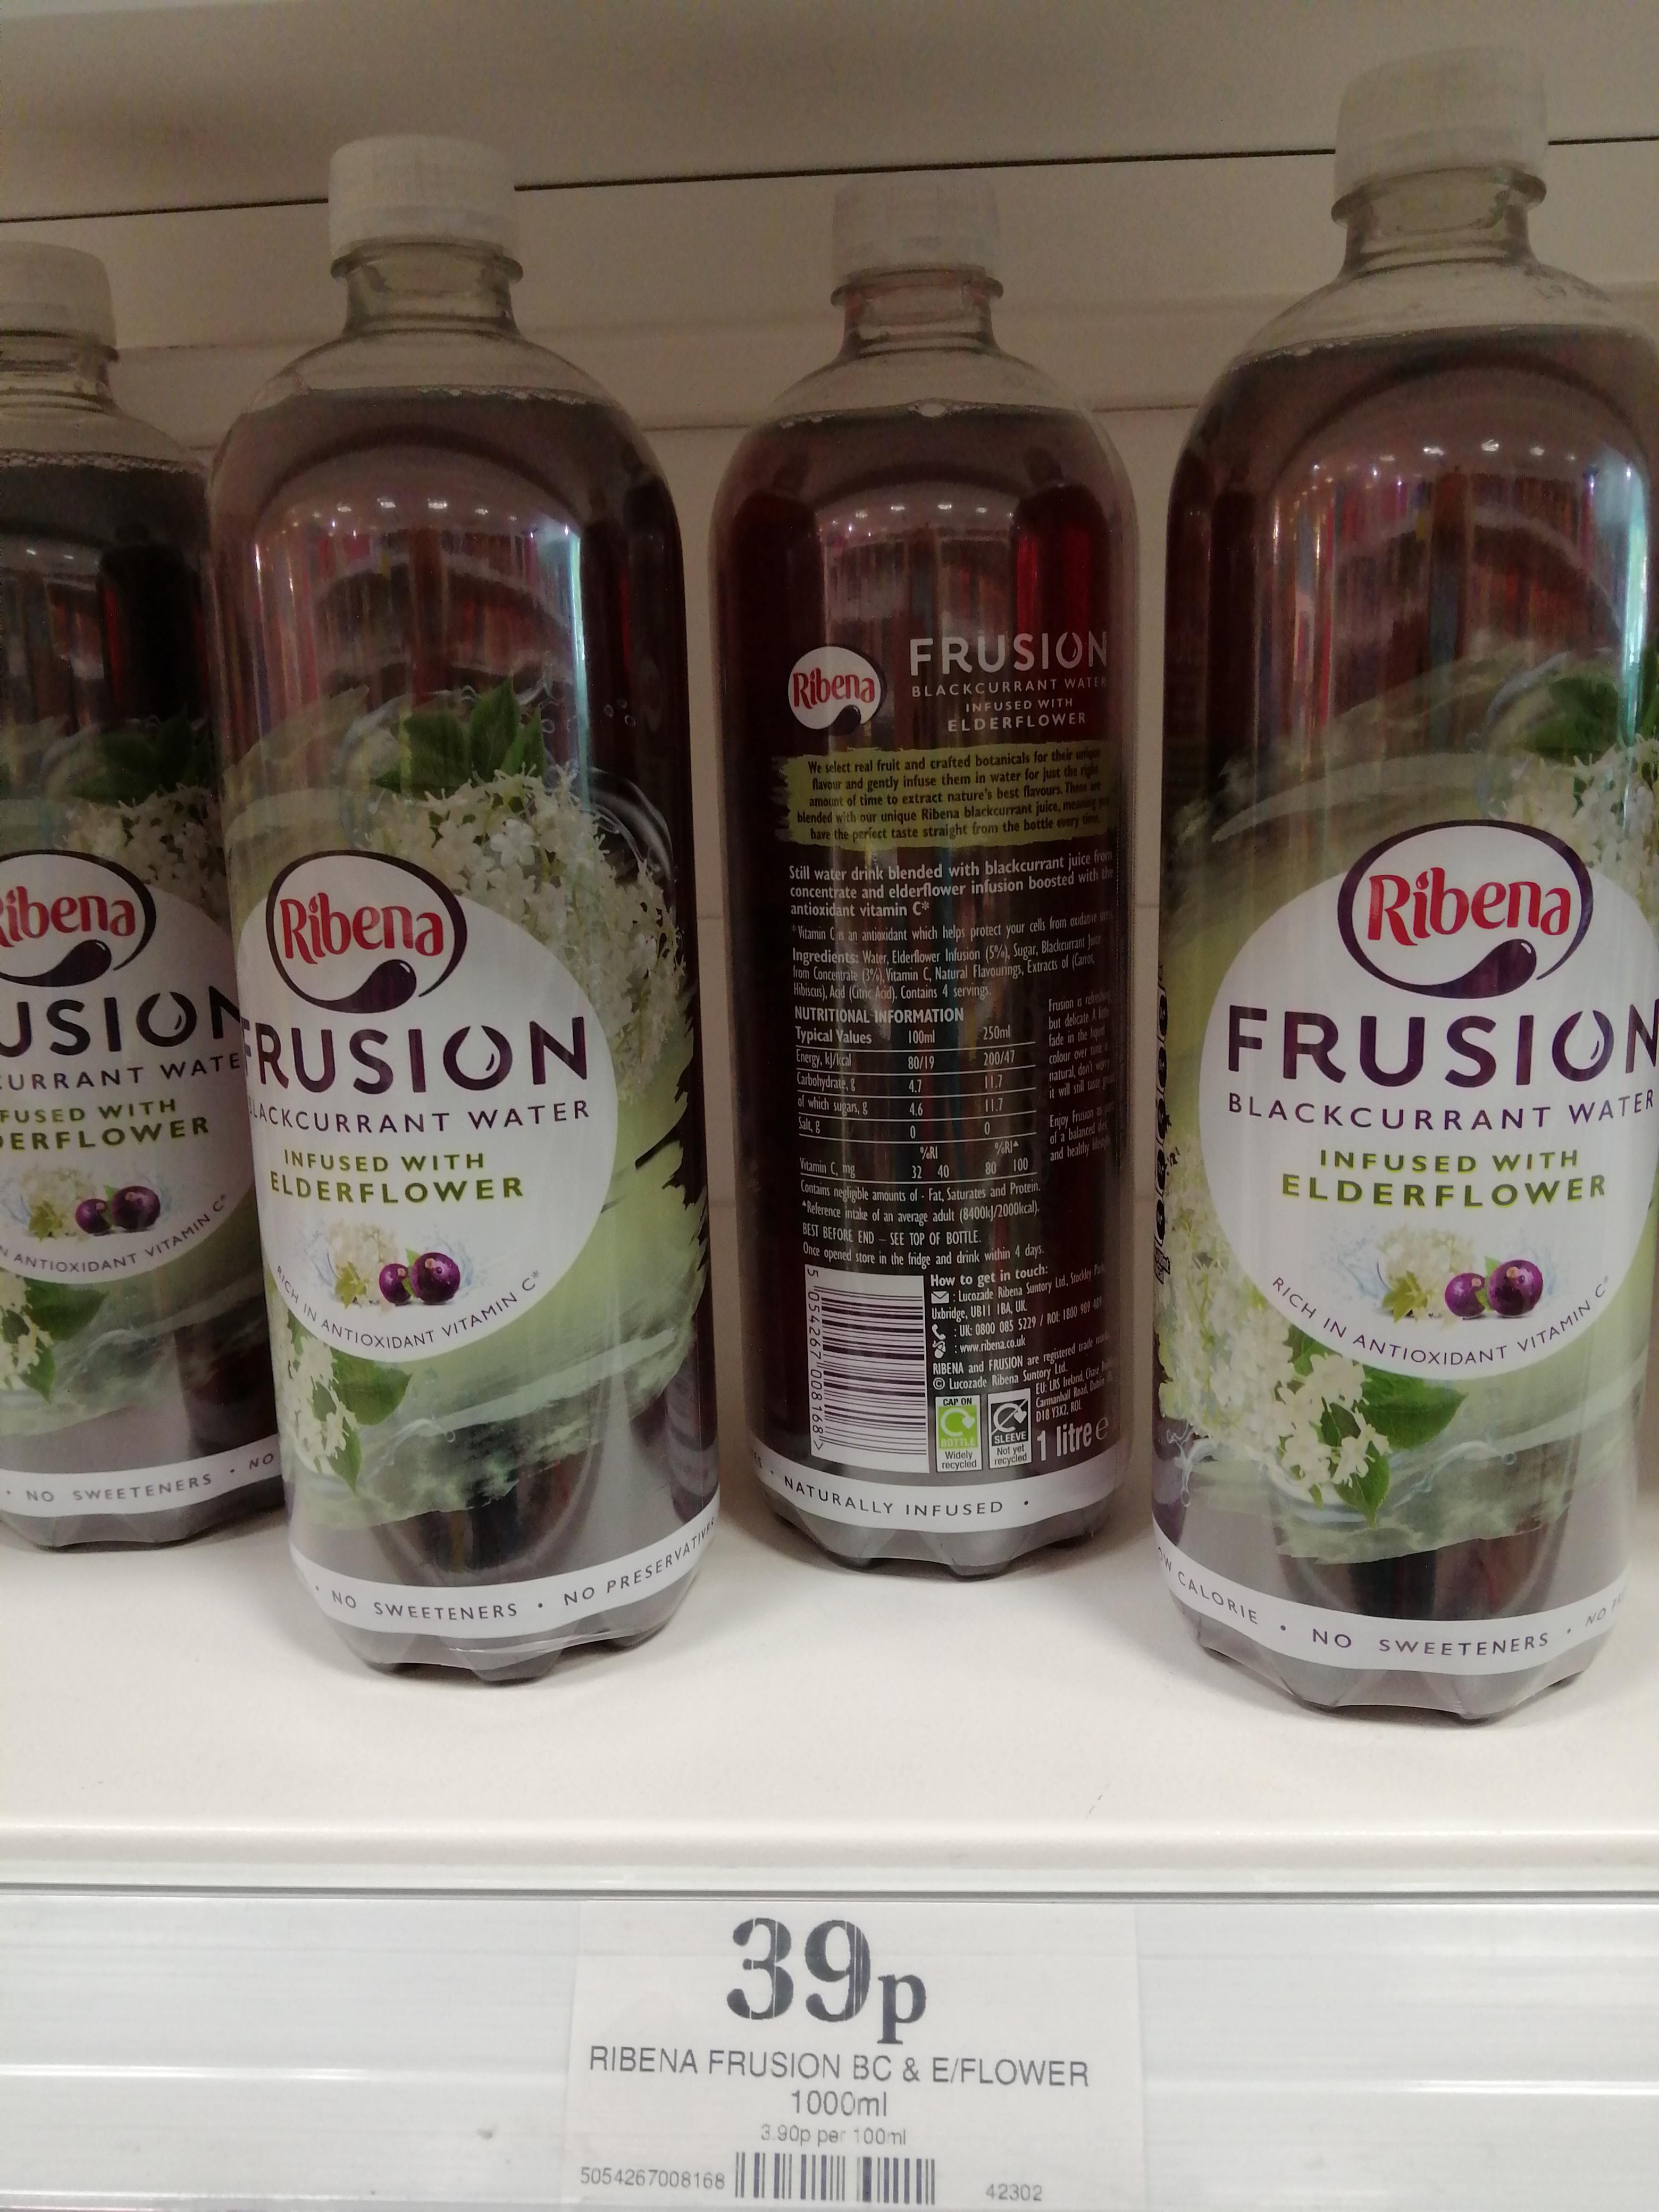 1Lt Ribena Frusion Blackcurrant & Elderflower water @ 39p at Home Bargains, in-store Bidston Moss (Wirral)